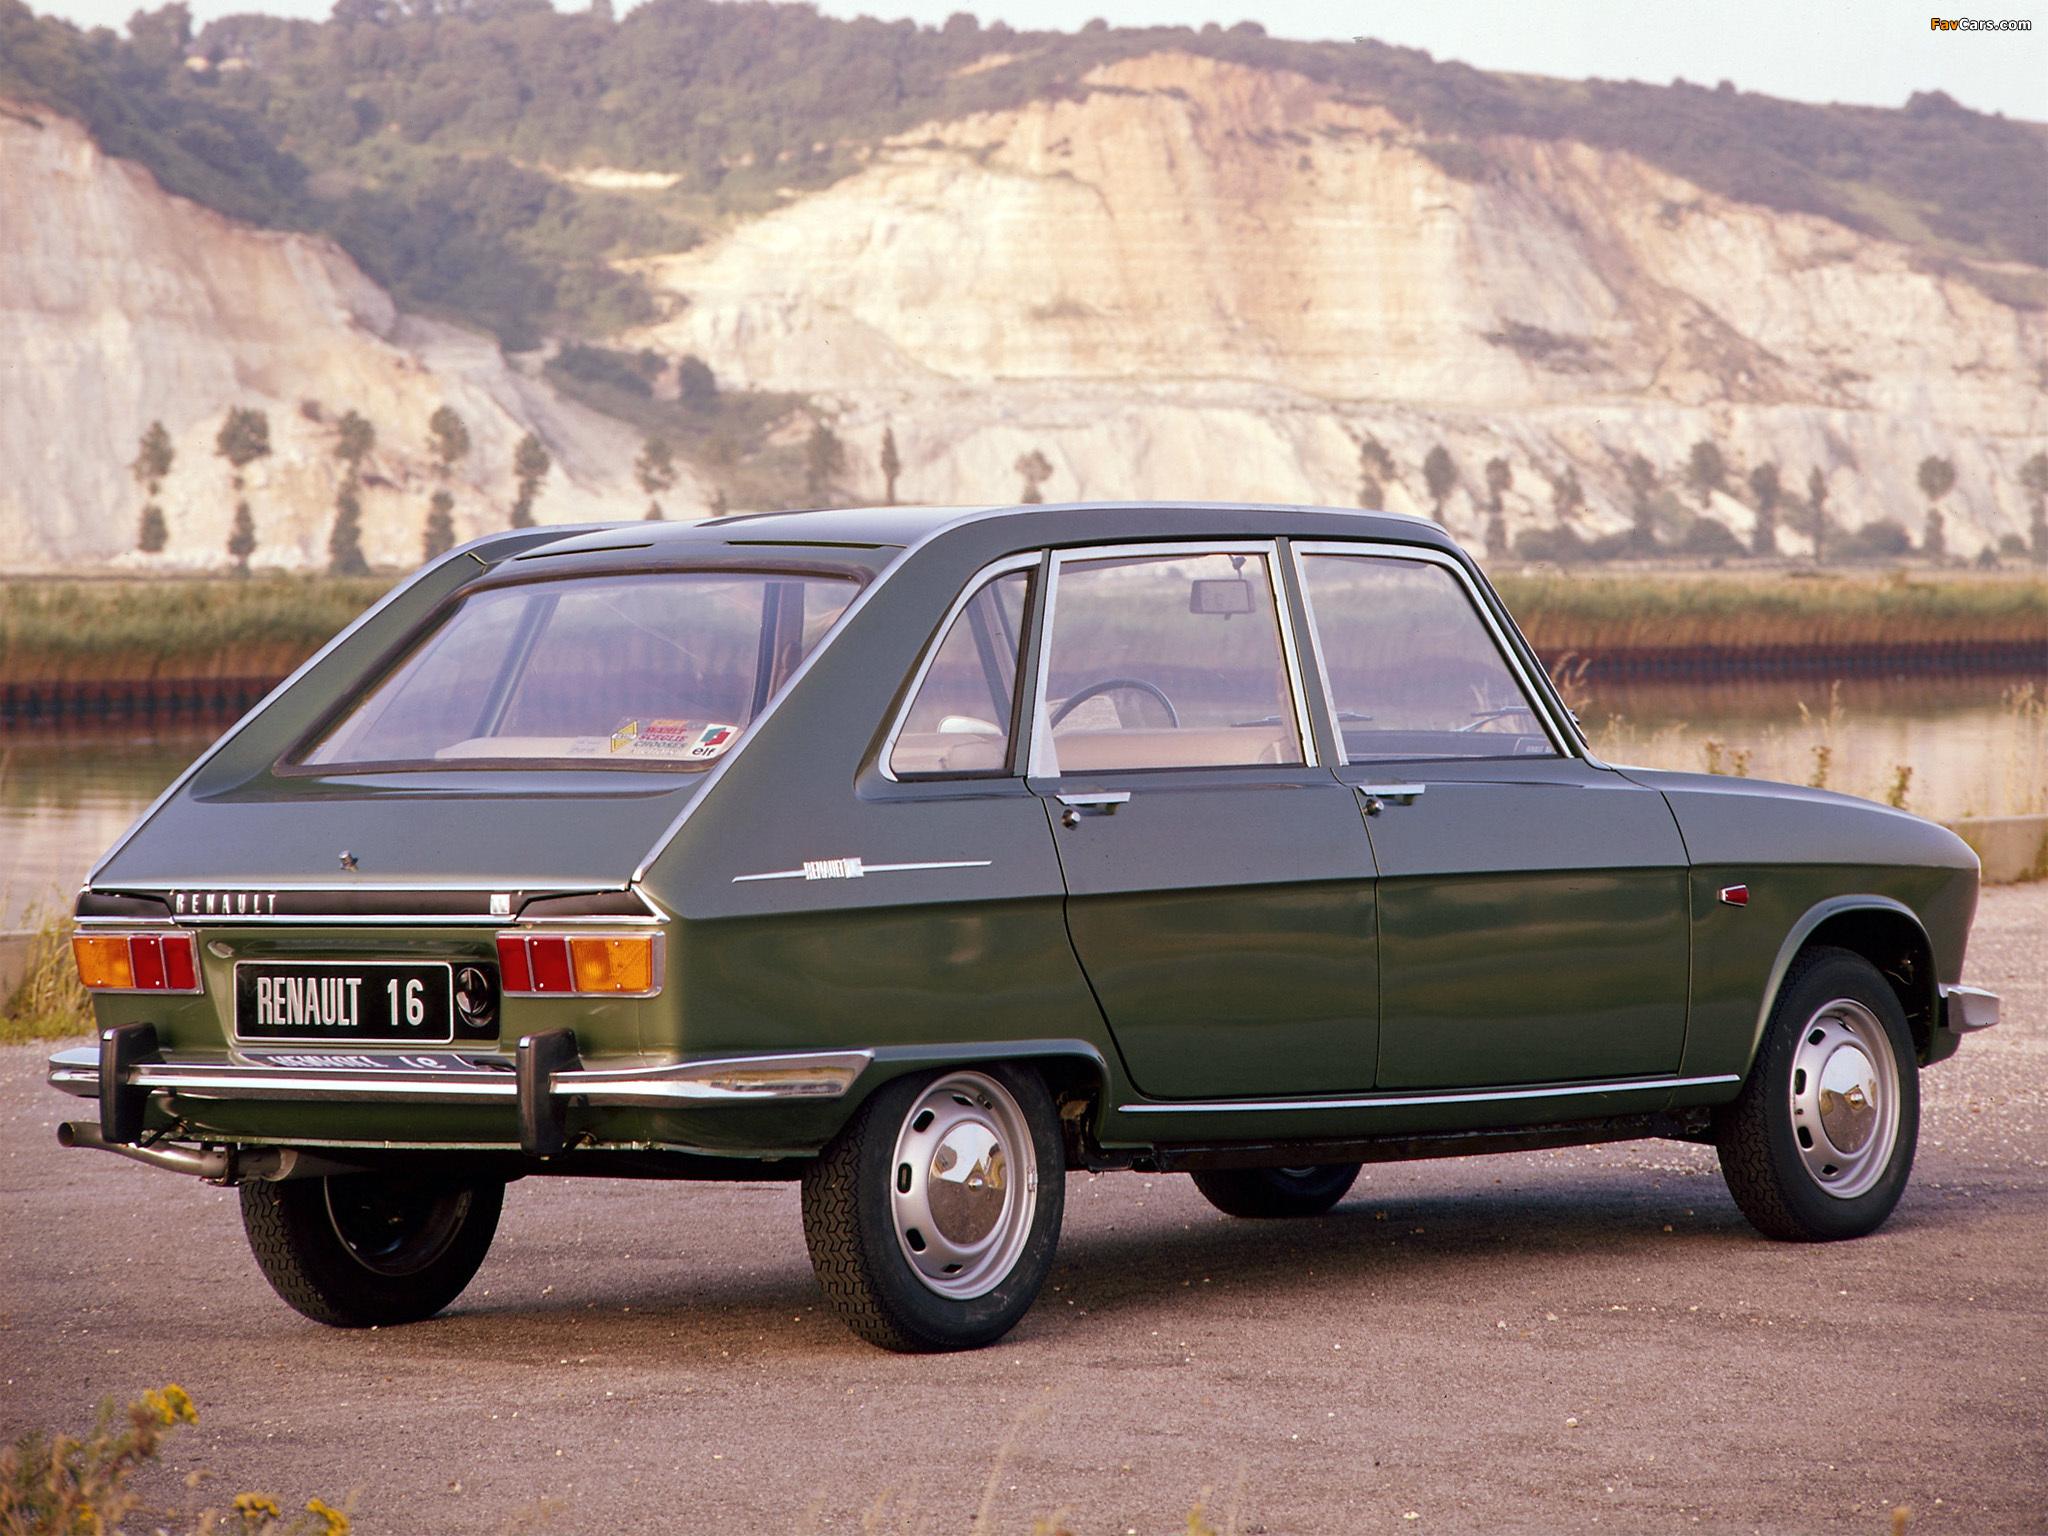 2048x1536 Car Wallpapers Renault 16 Tl 1974 80 Photos 2048x1536